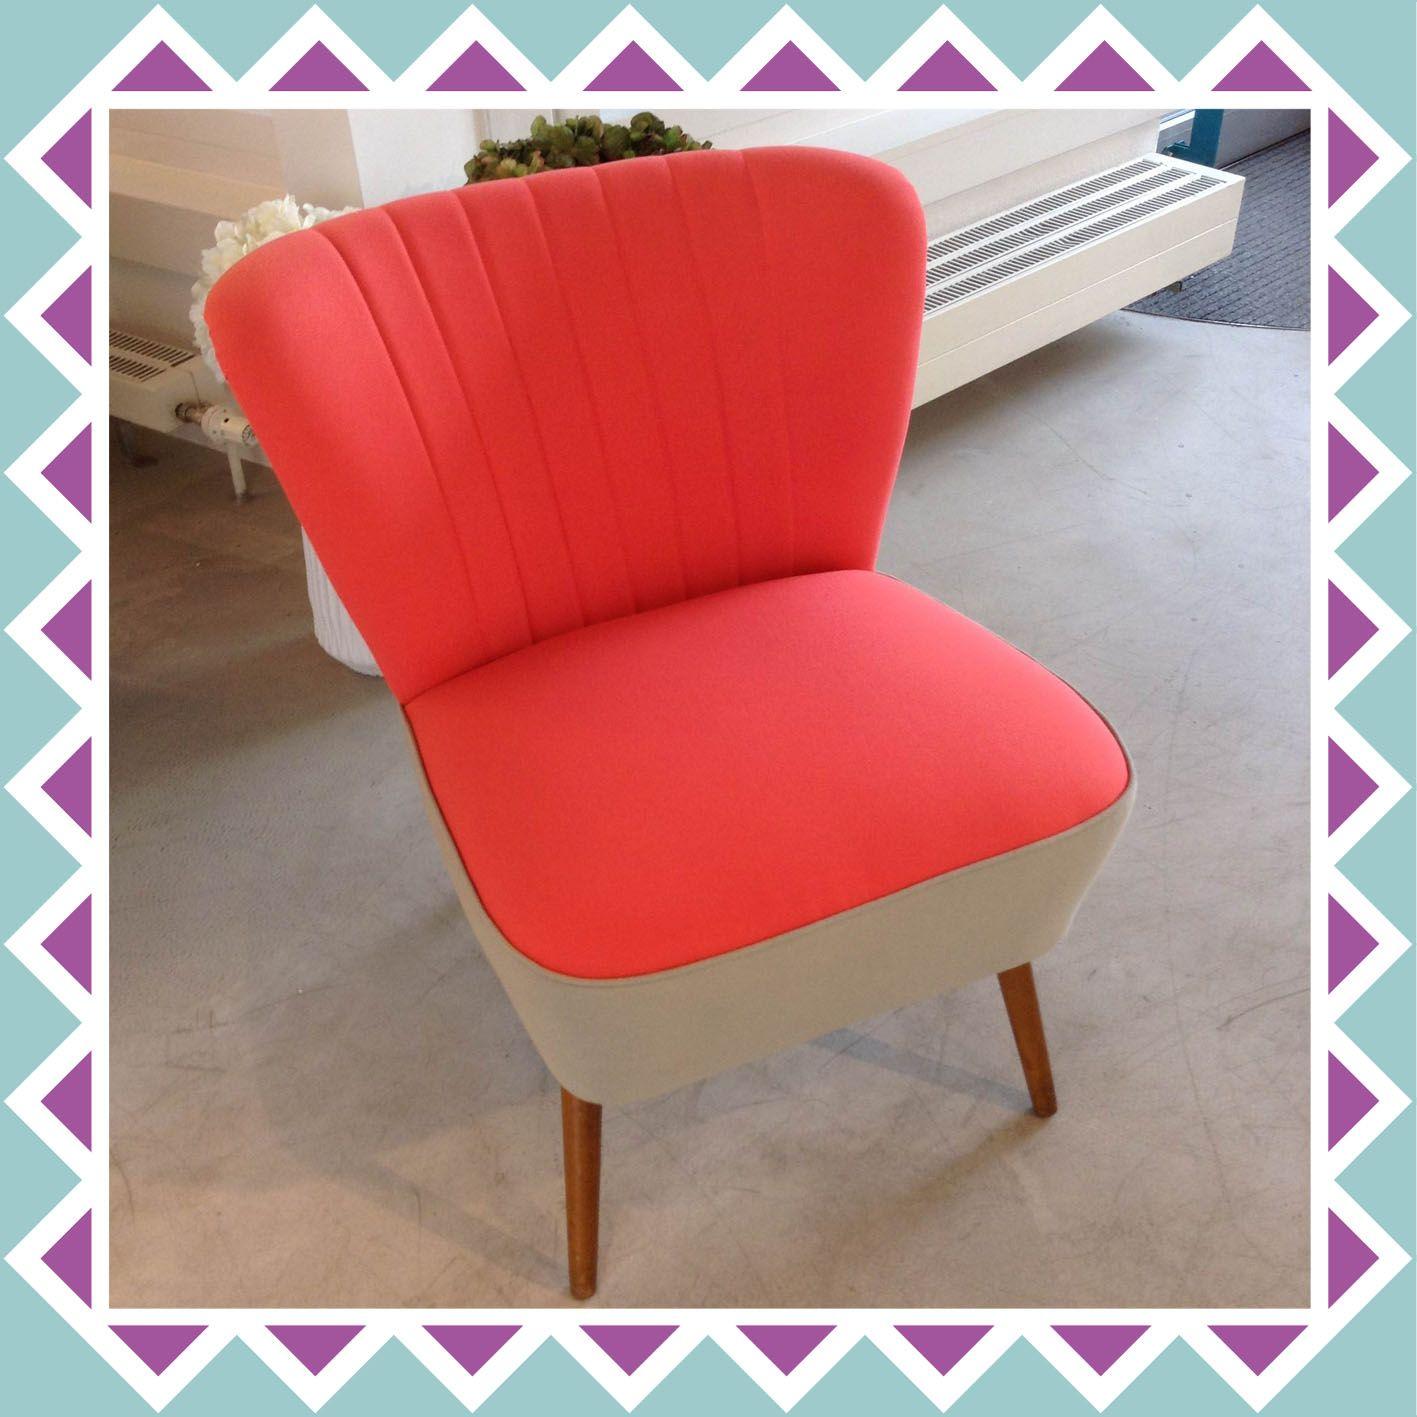 Holz Factory rosie blush holz möbel verfeinertes design hook eye